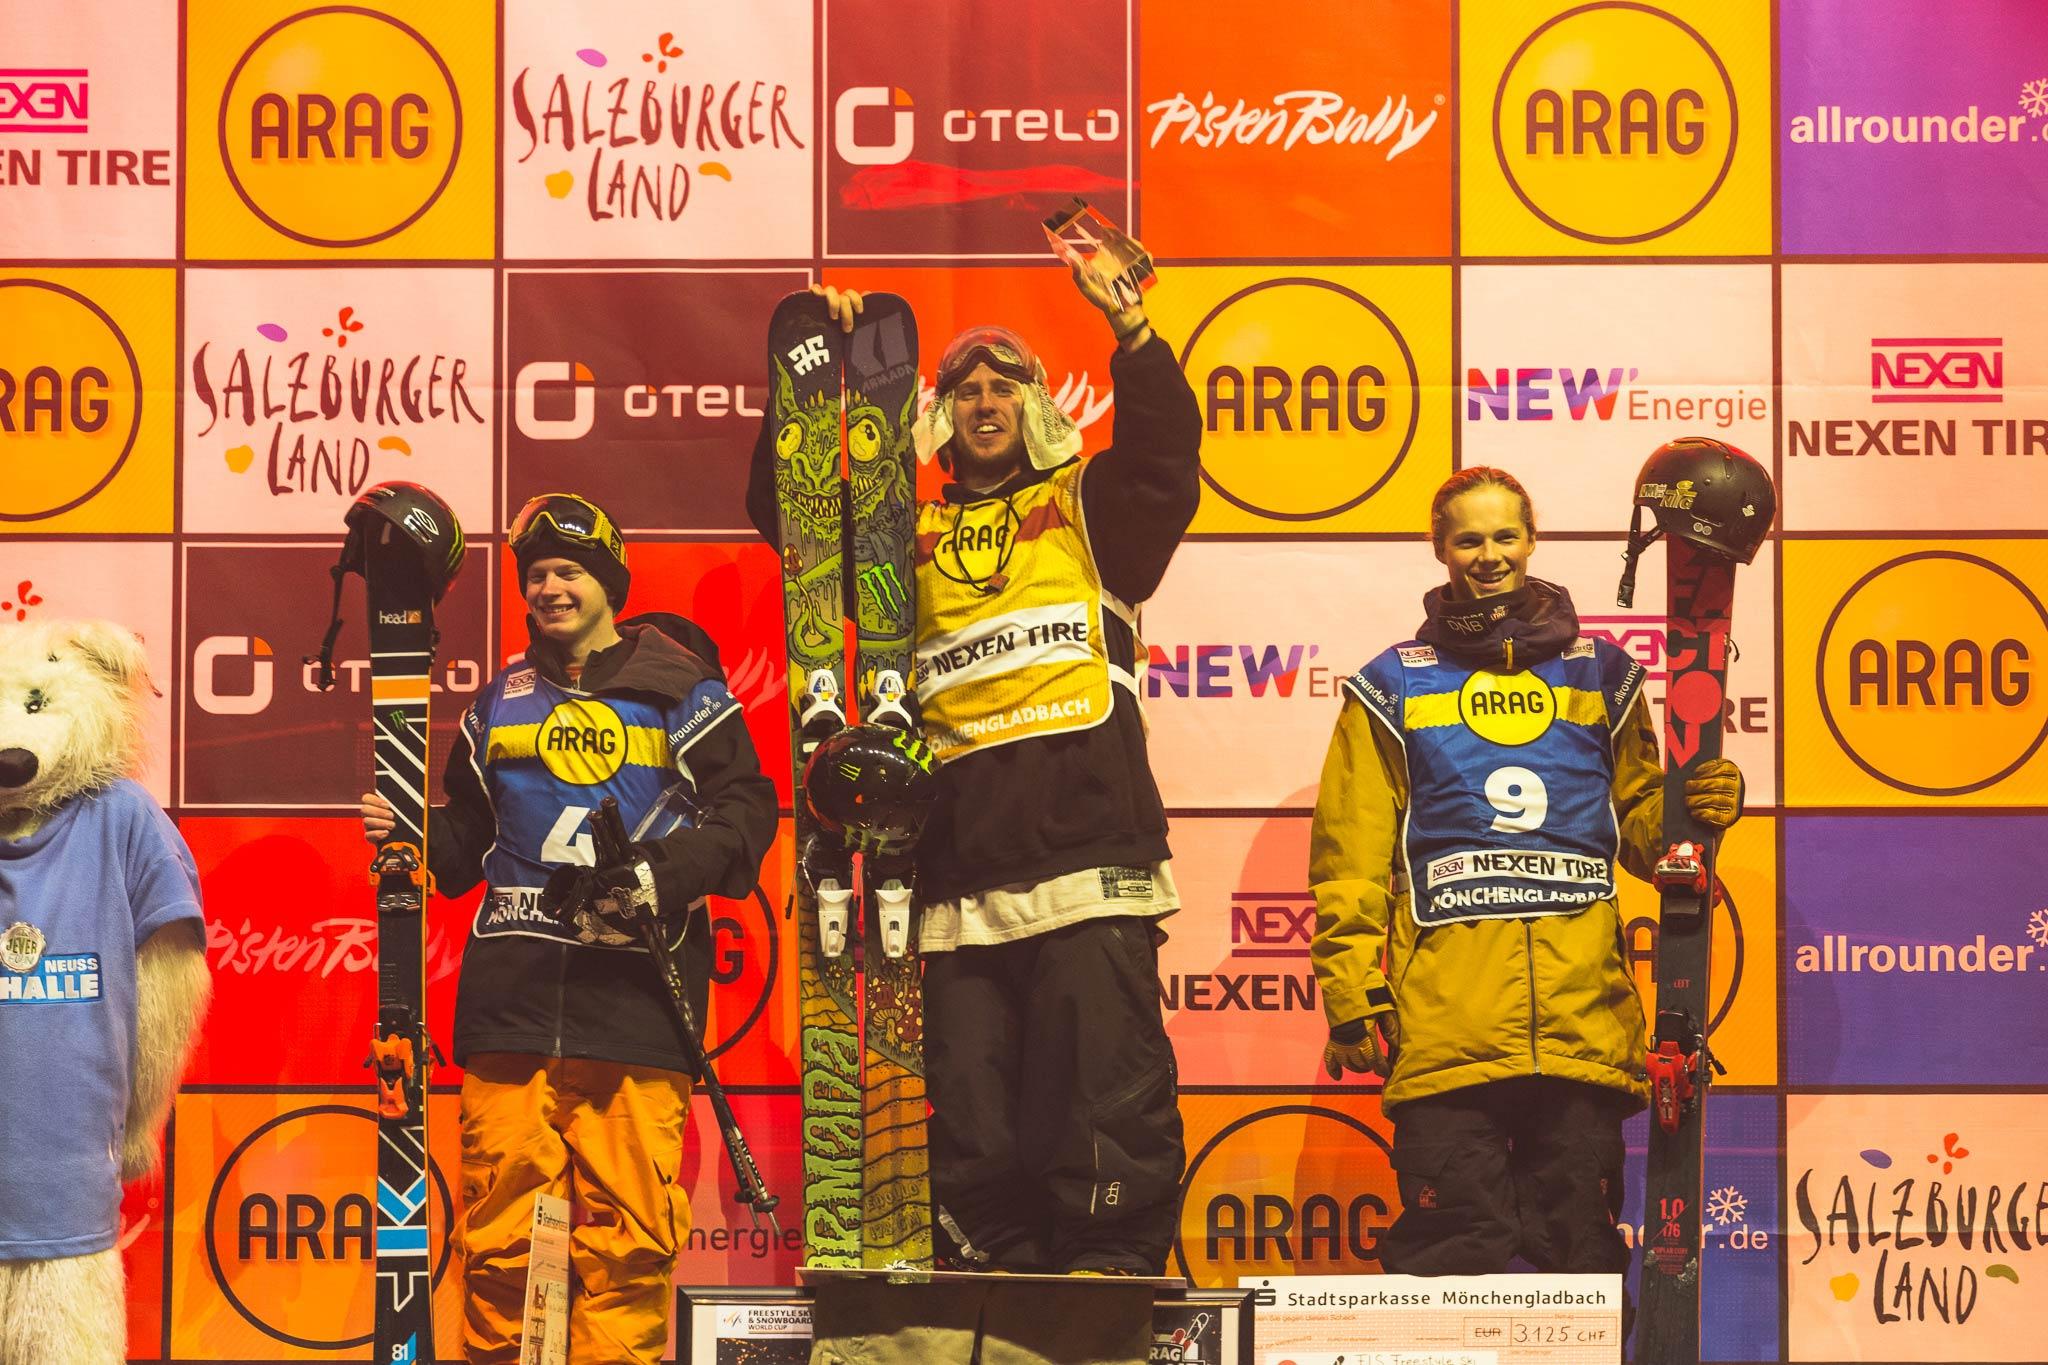 Die Top 3 Männer: Luca Schuler, Henrik Harlaut, Eirik Sateroy (v.l.n.r.)